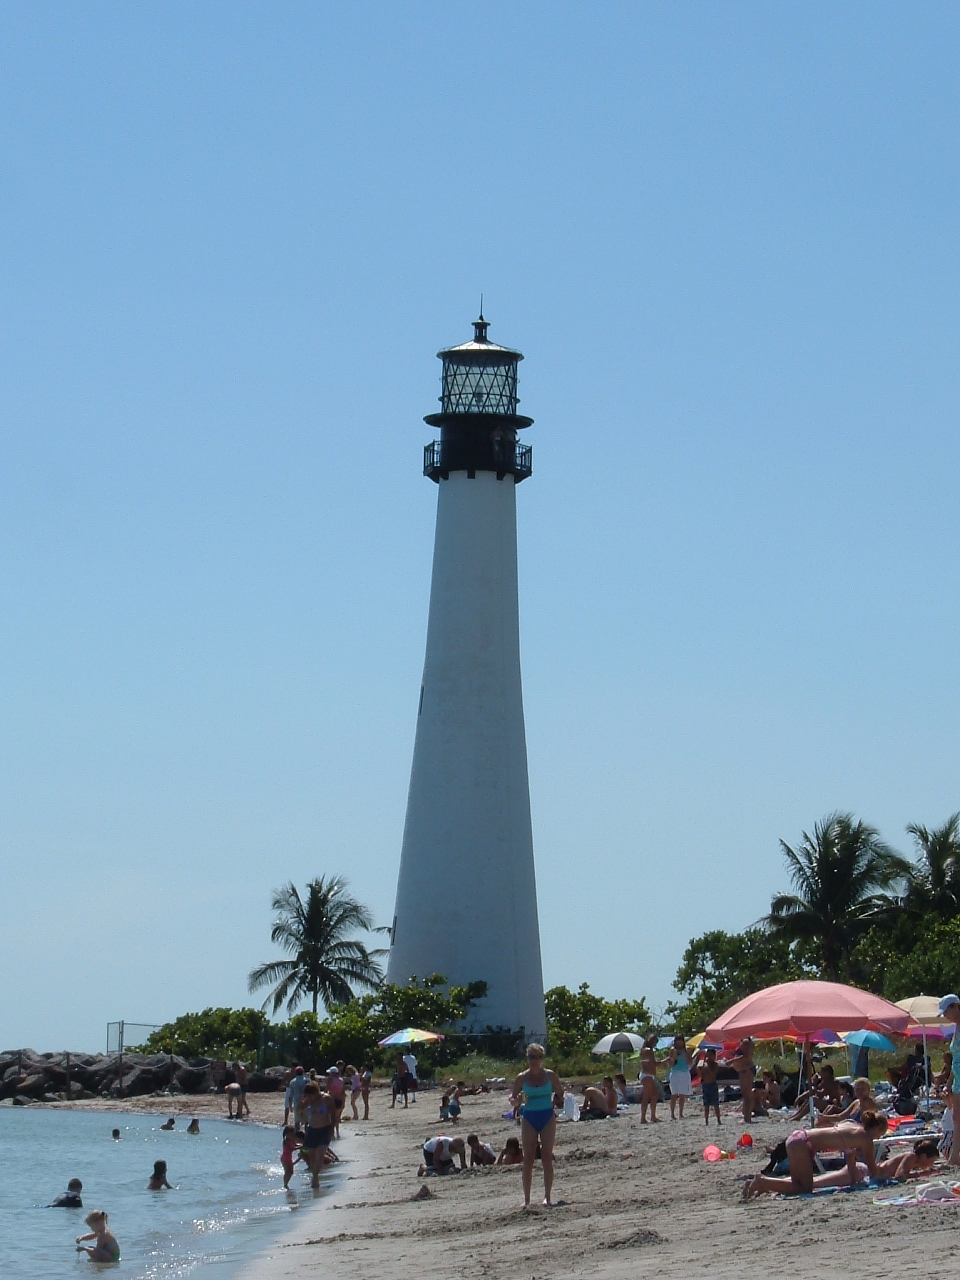 Cape Florida Light - Wikipedia